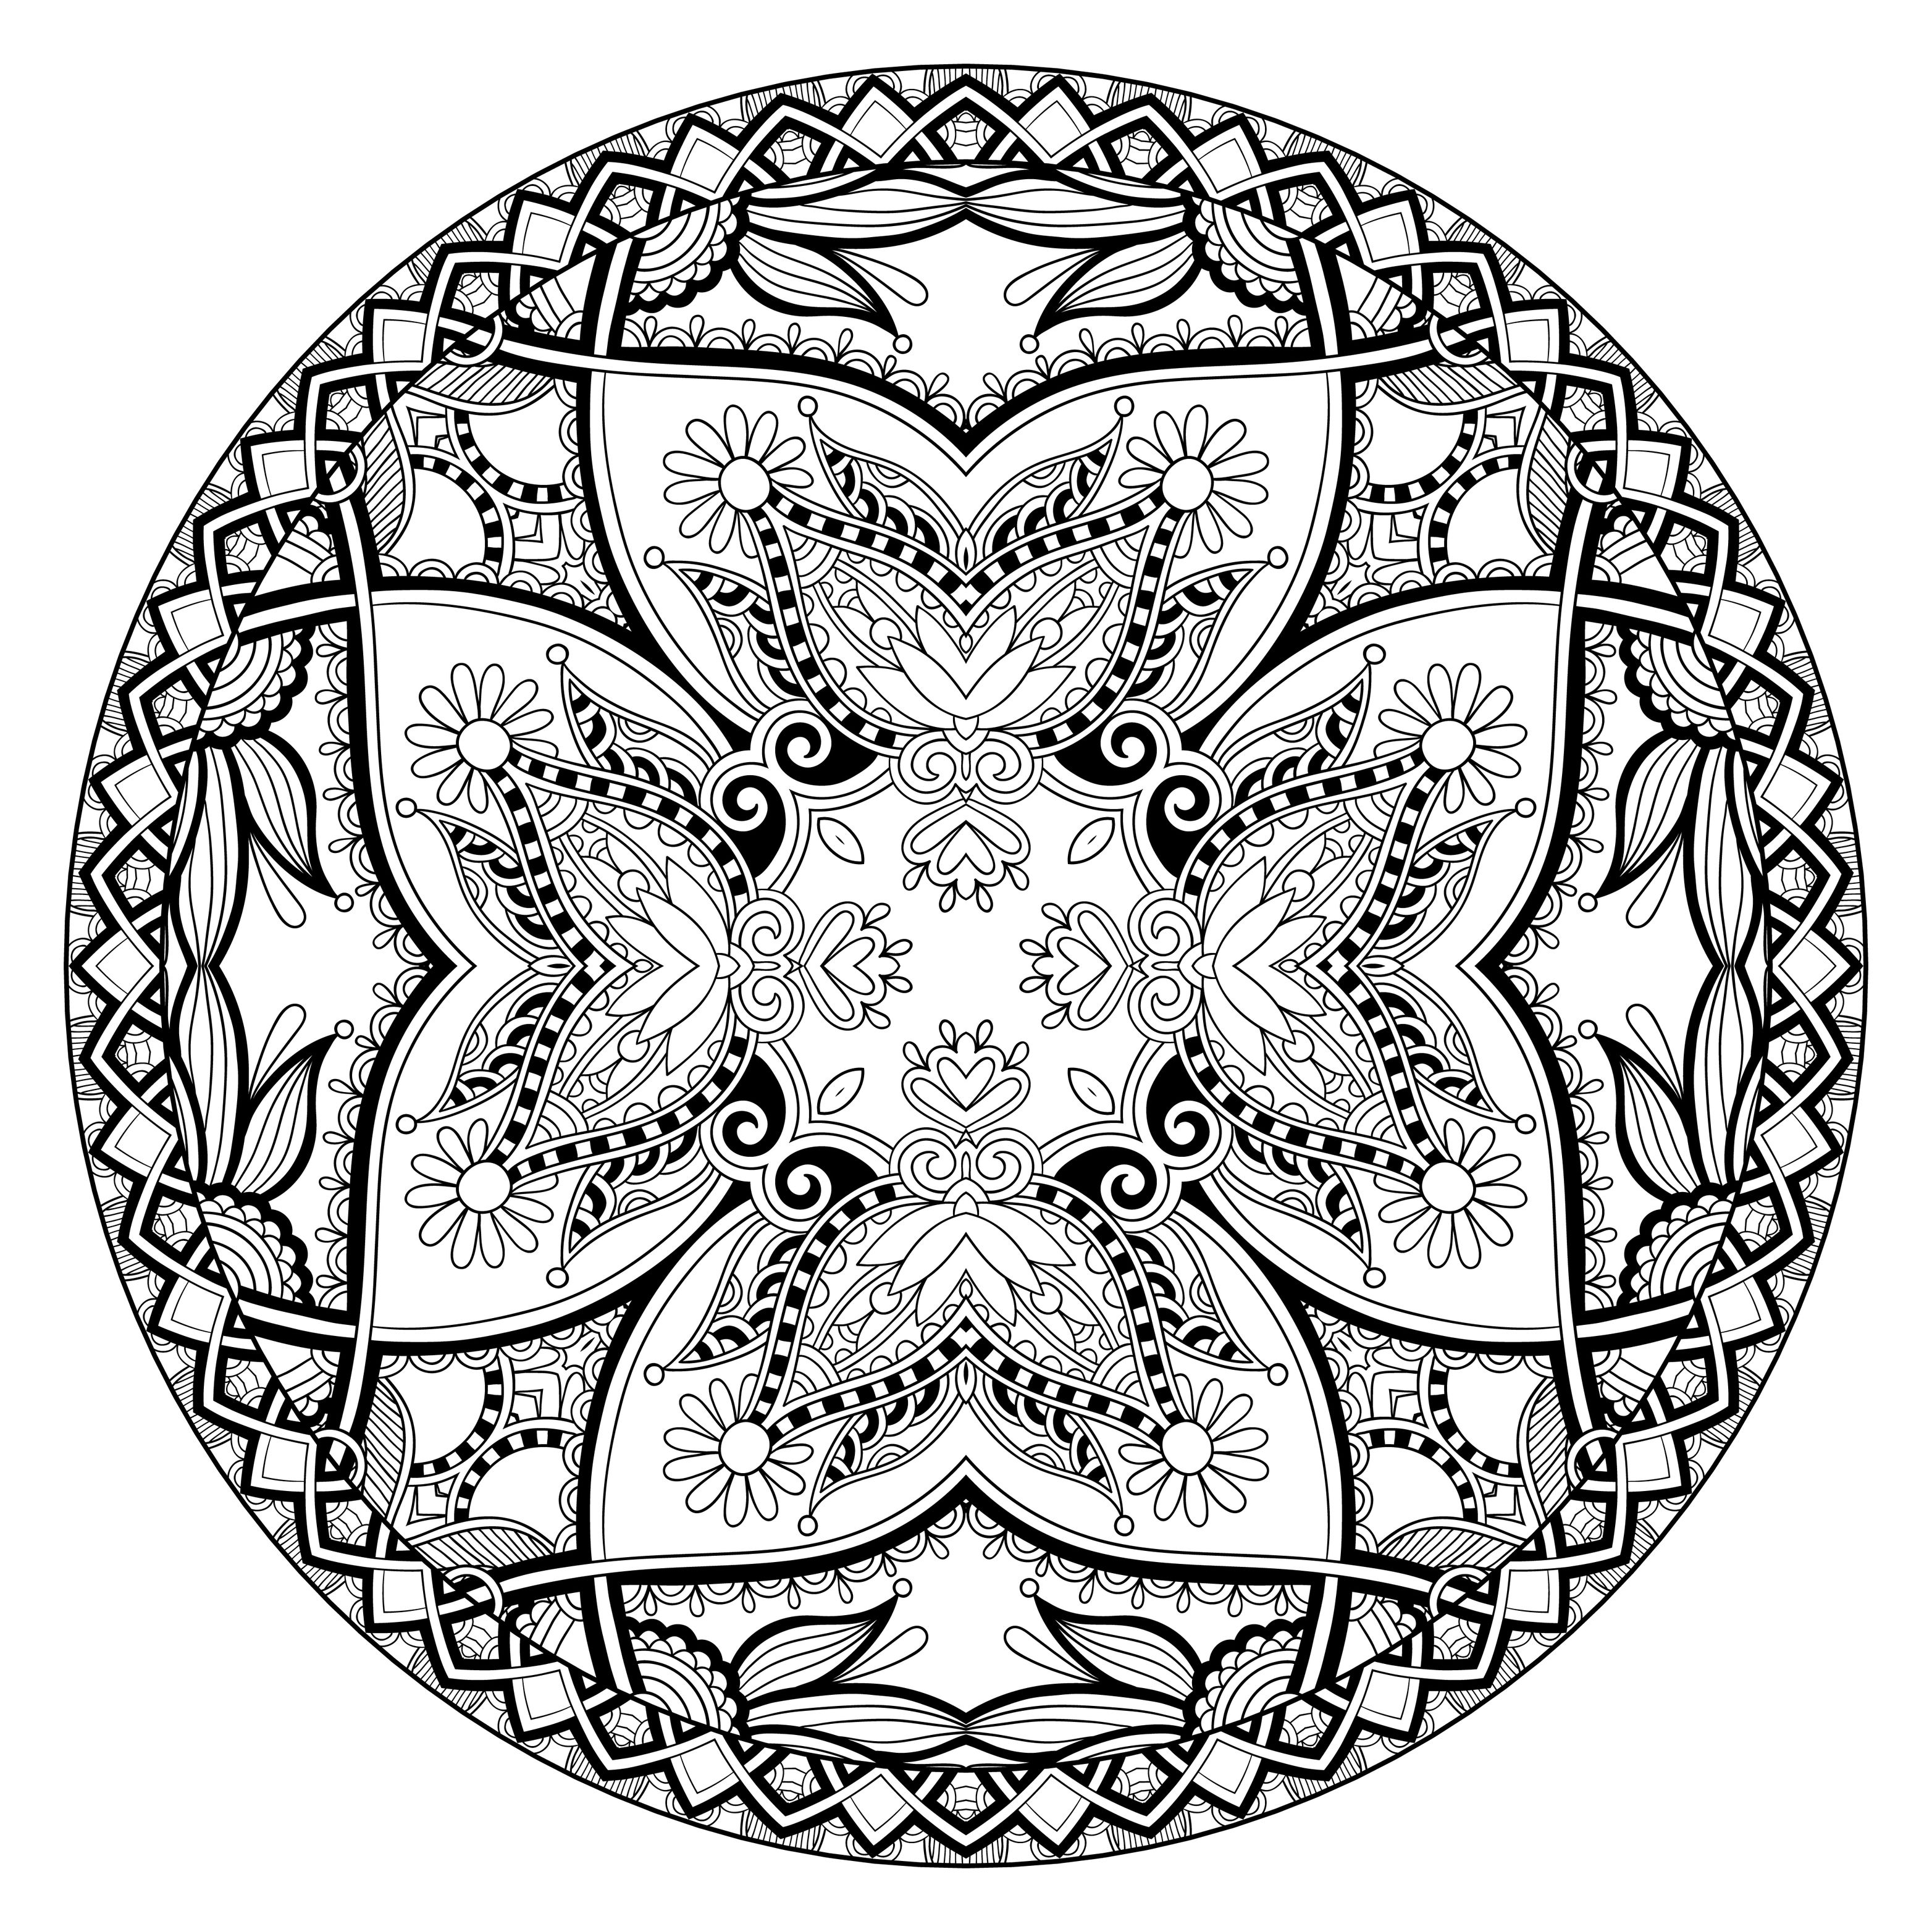 Mandalas to download for free by Lesya Kara-Kotsya